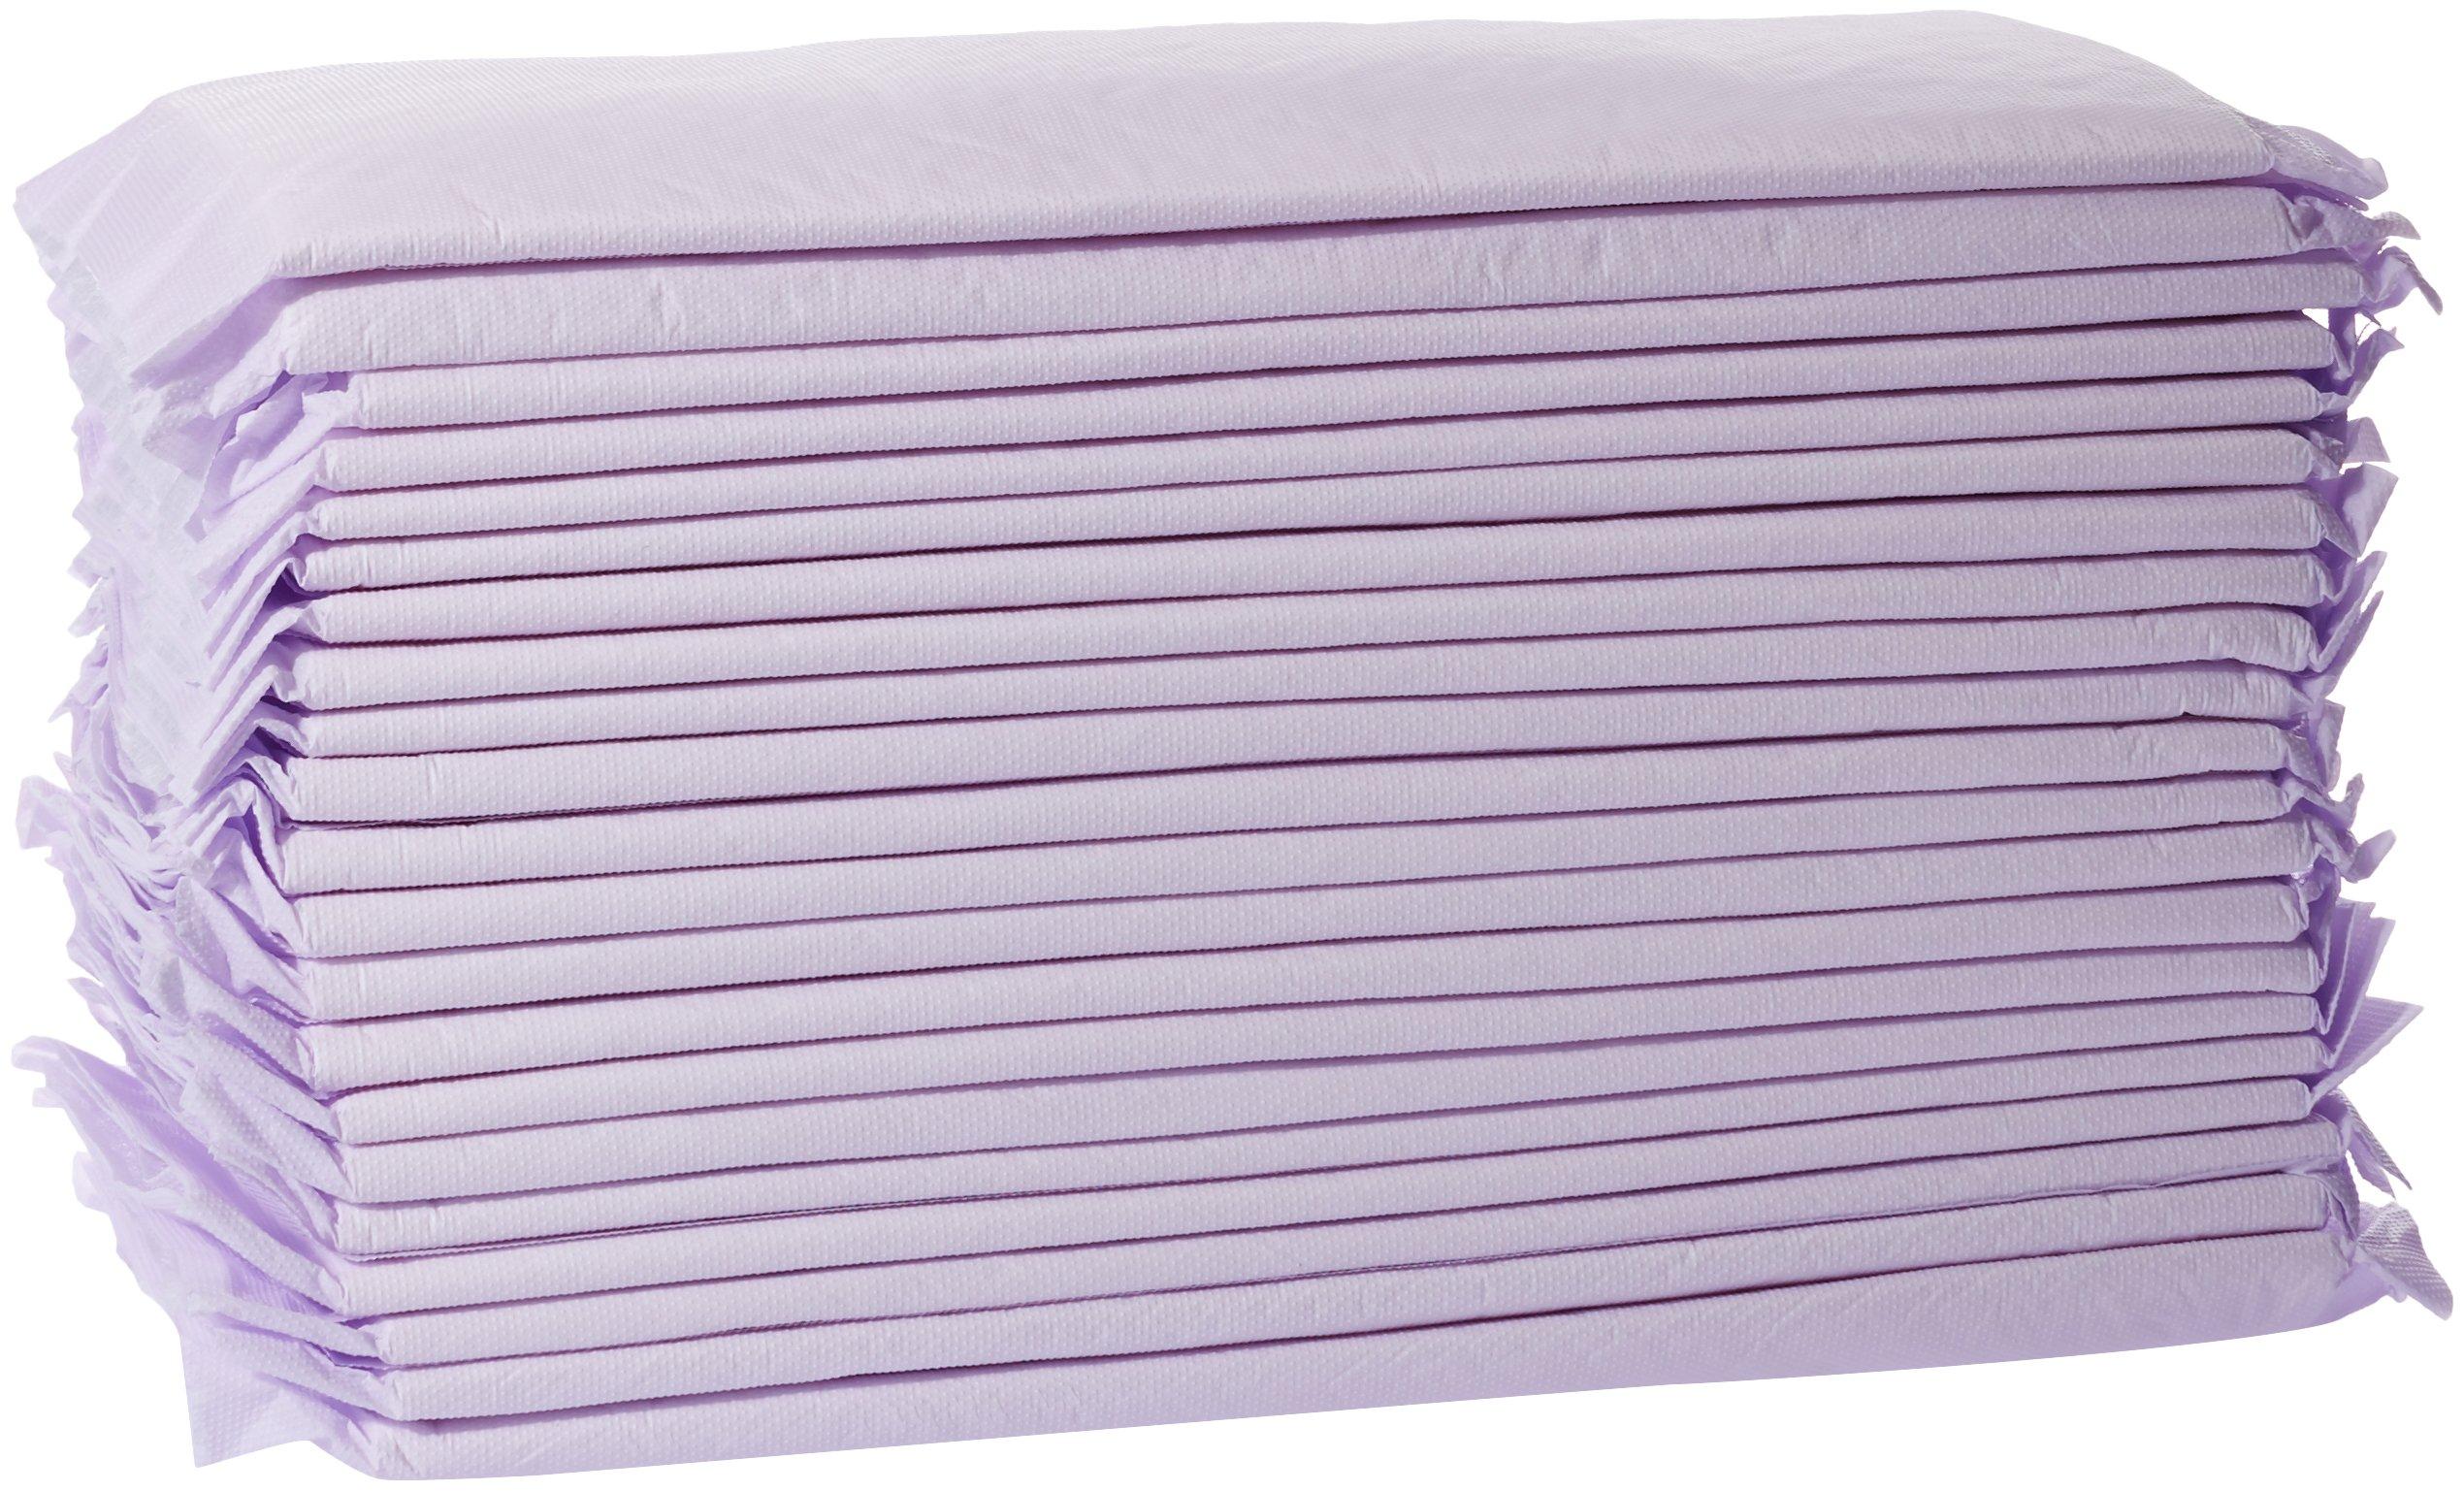 AmazonBasics Cat Litter Box Pads - Pack of 40, Unscented by AmazonBasics